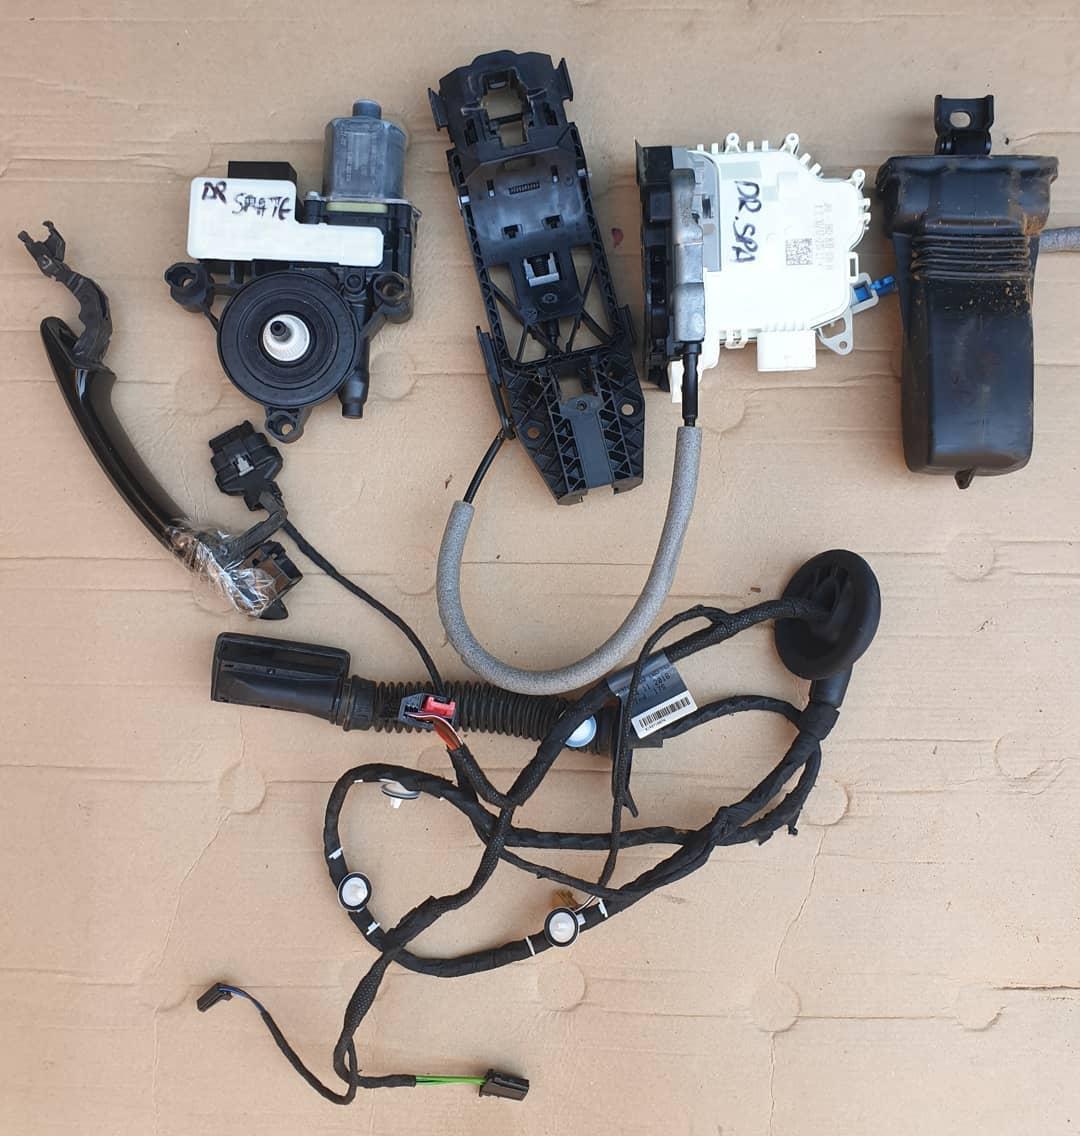 Audi Q2 Macara geam, plastic usa, instalatie, balama, maner, motoras usa, broasca, incuietoare.